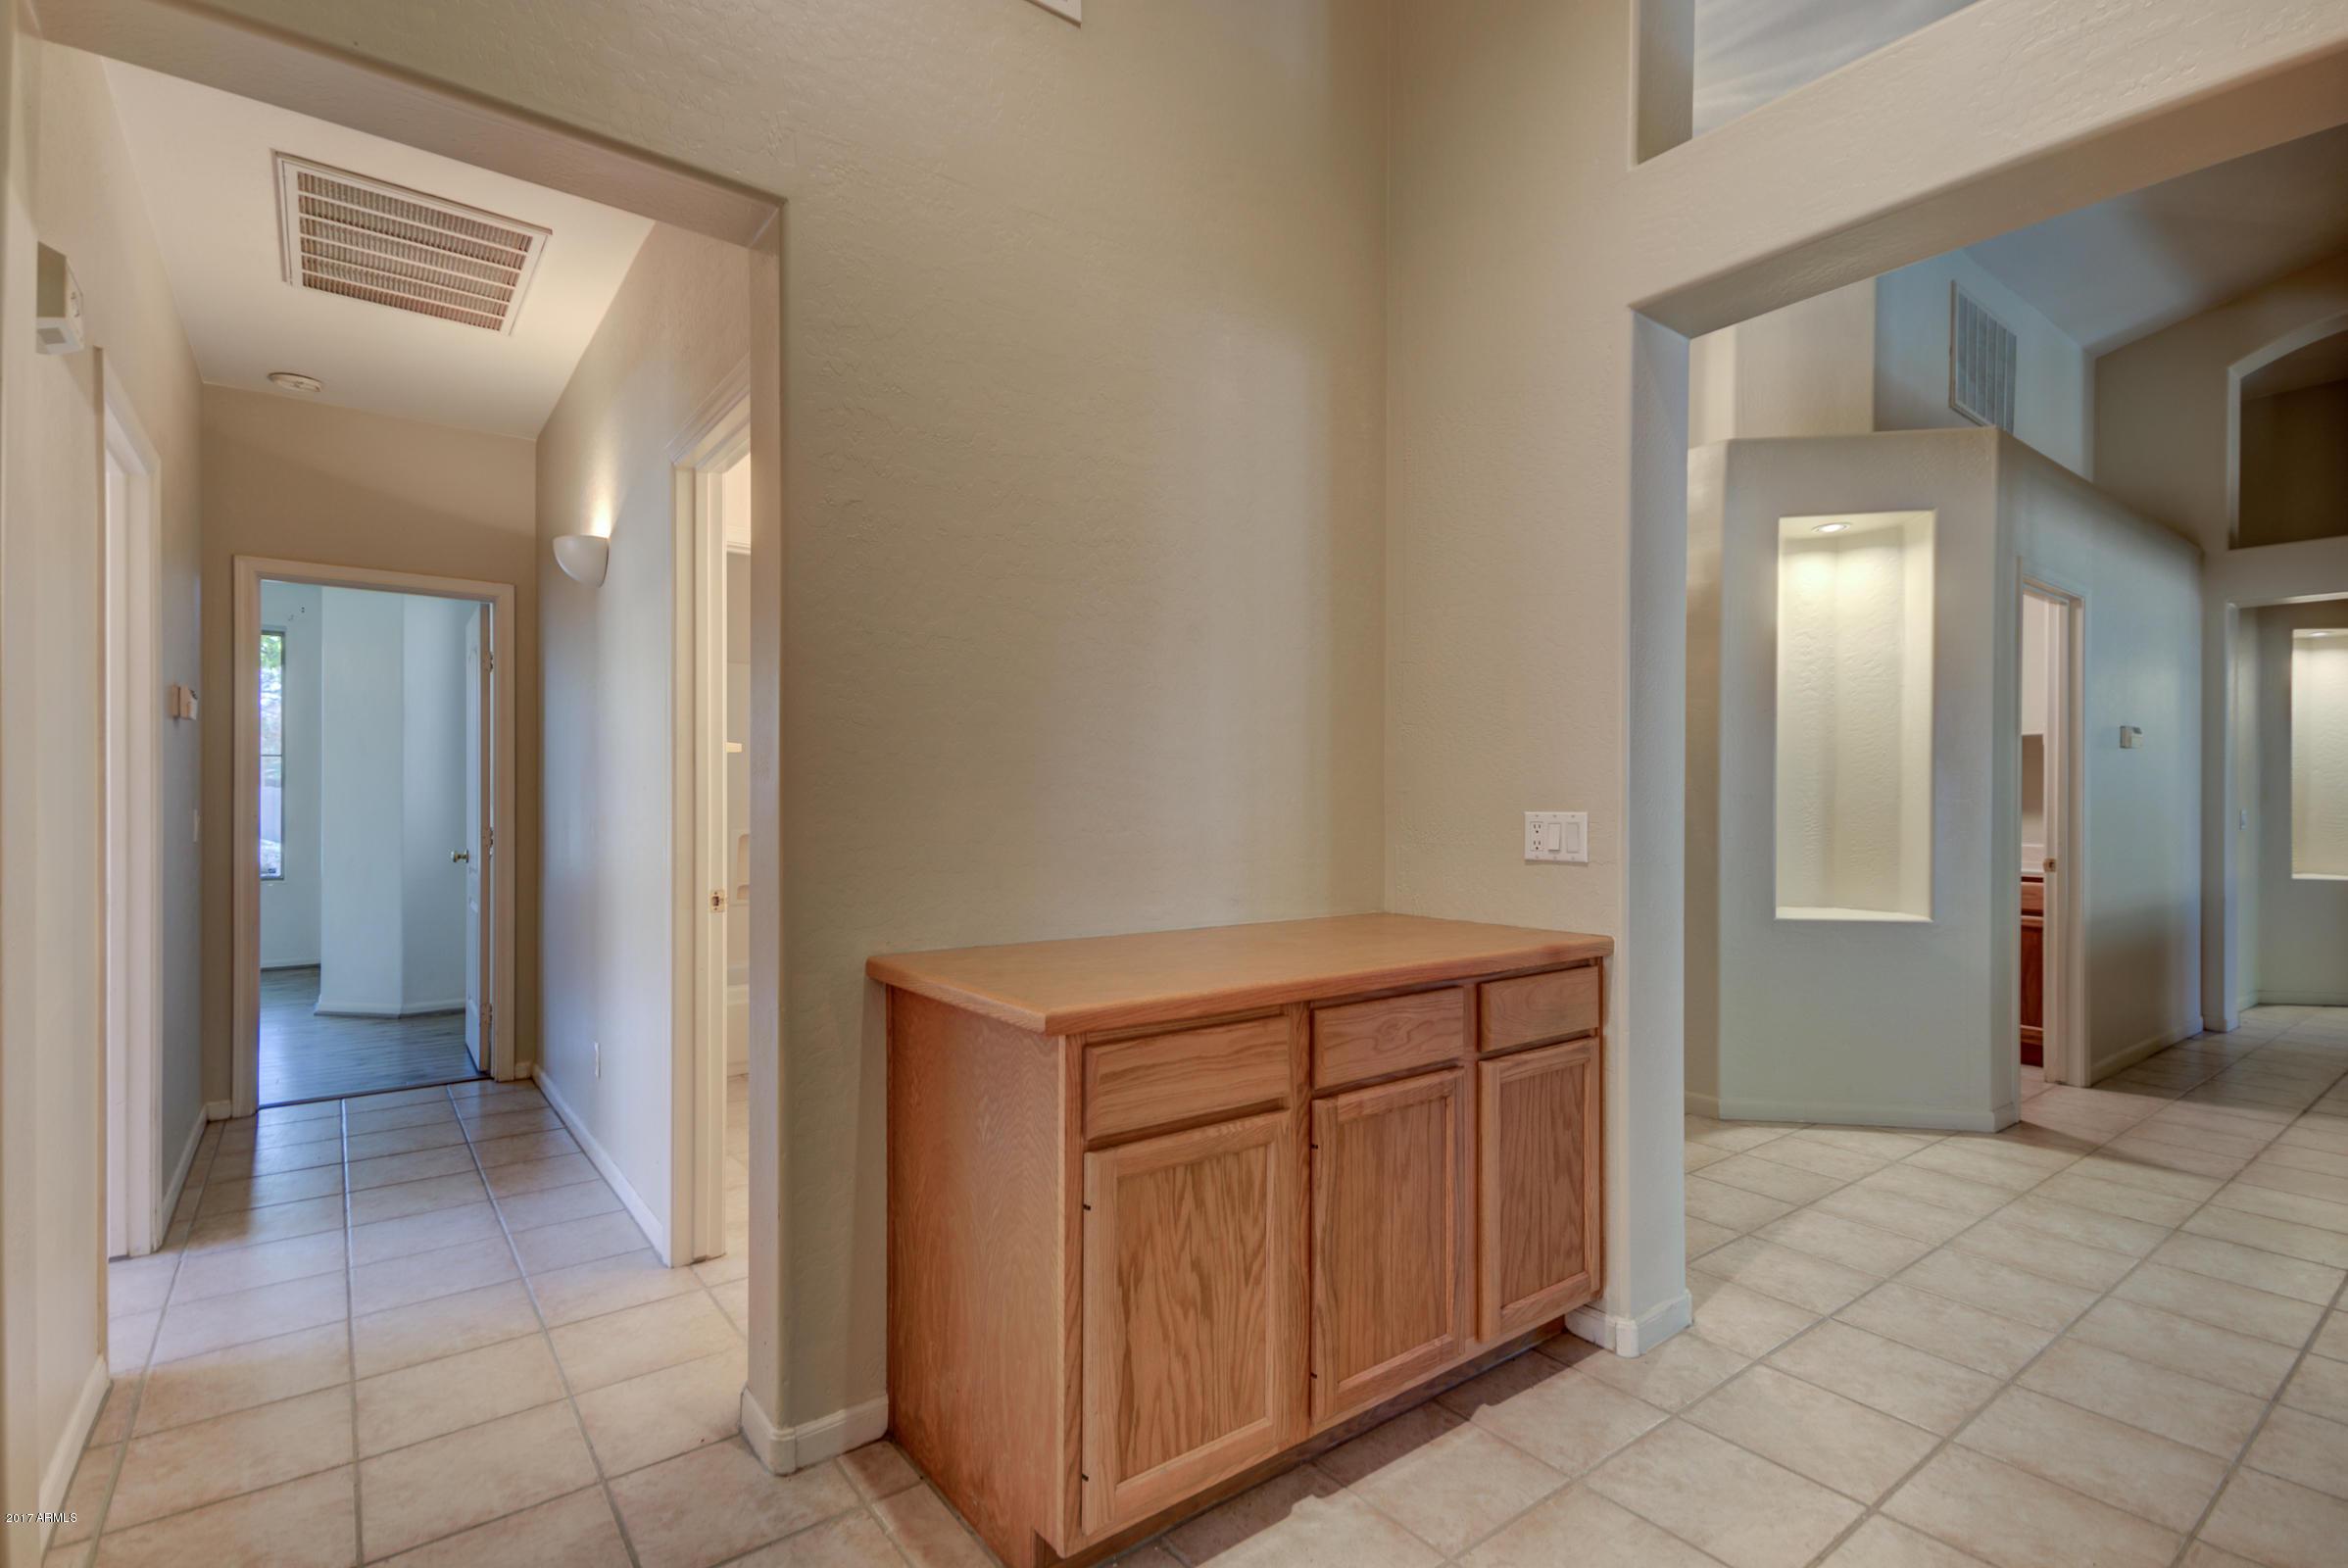 304 S Ironwood  Street Gilbert, AZ 85296 - img23